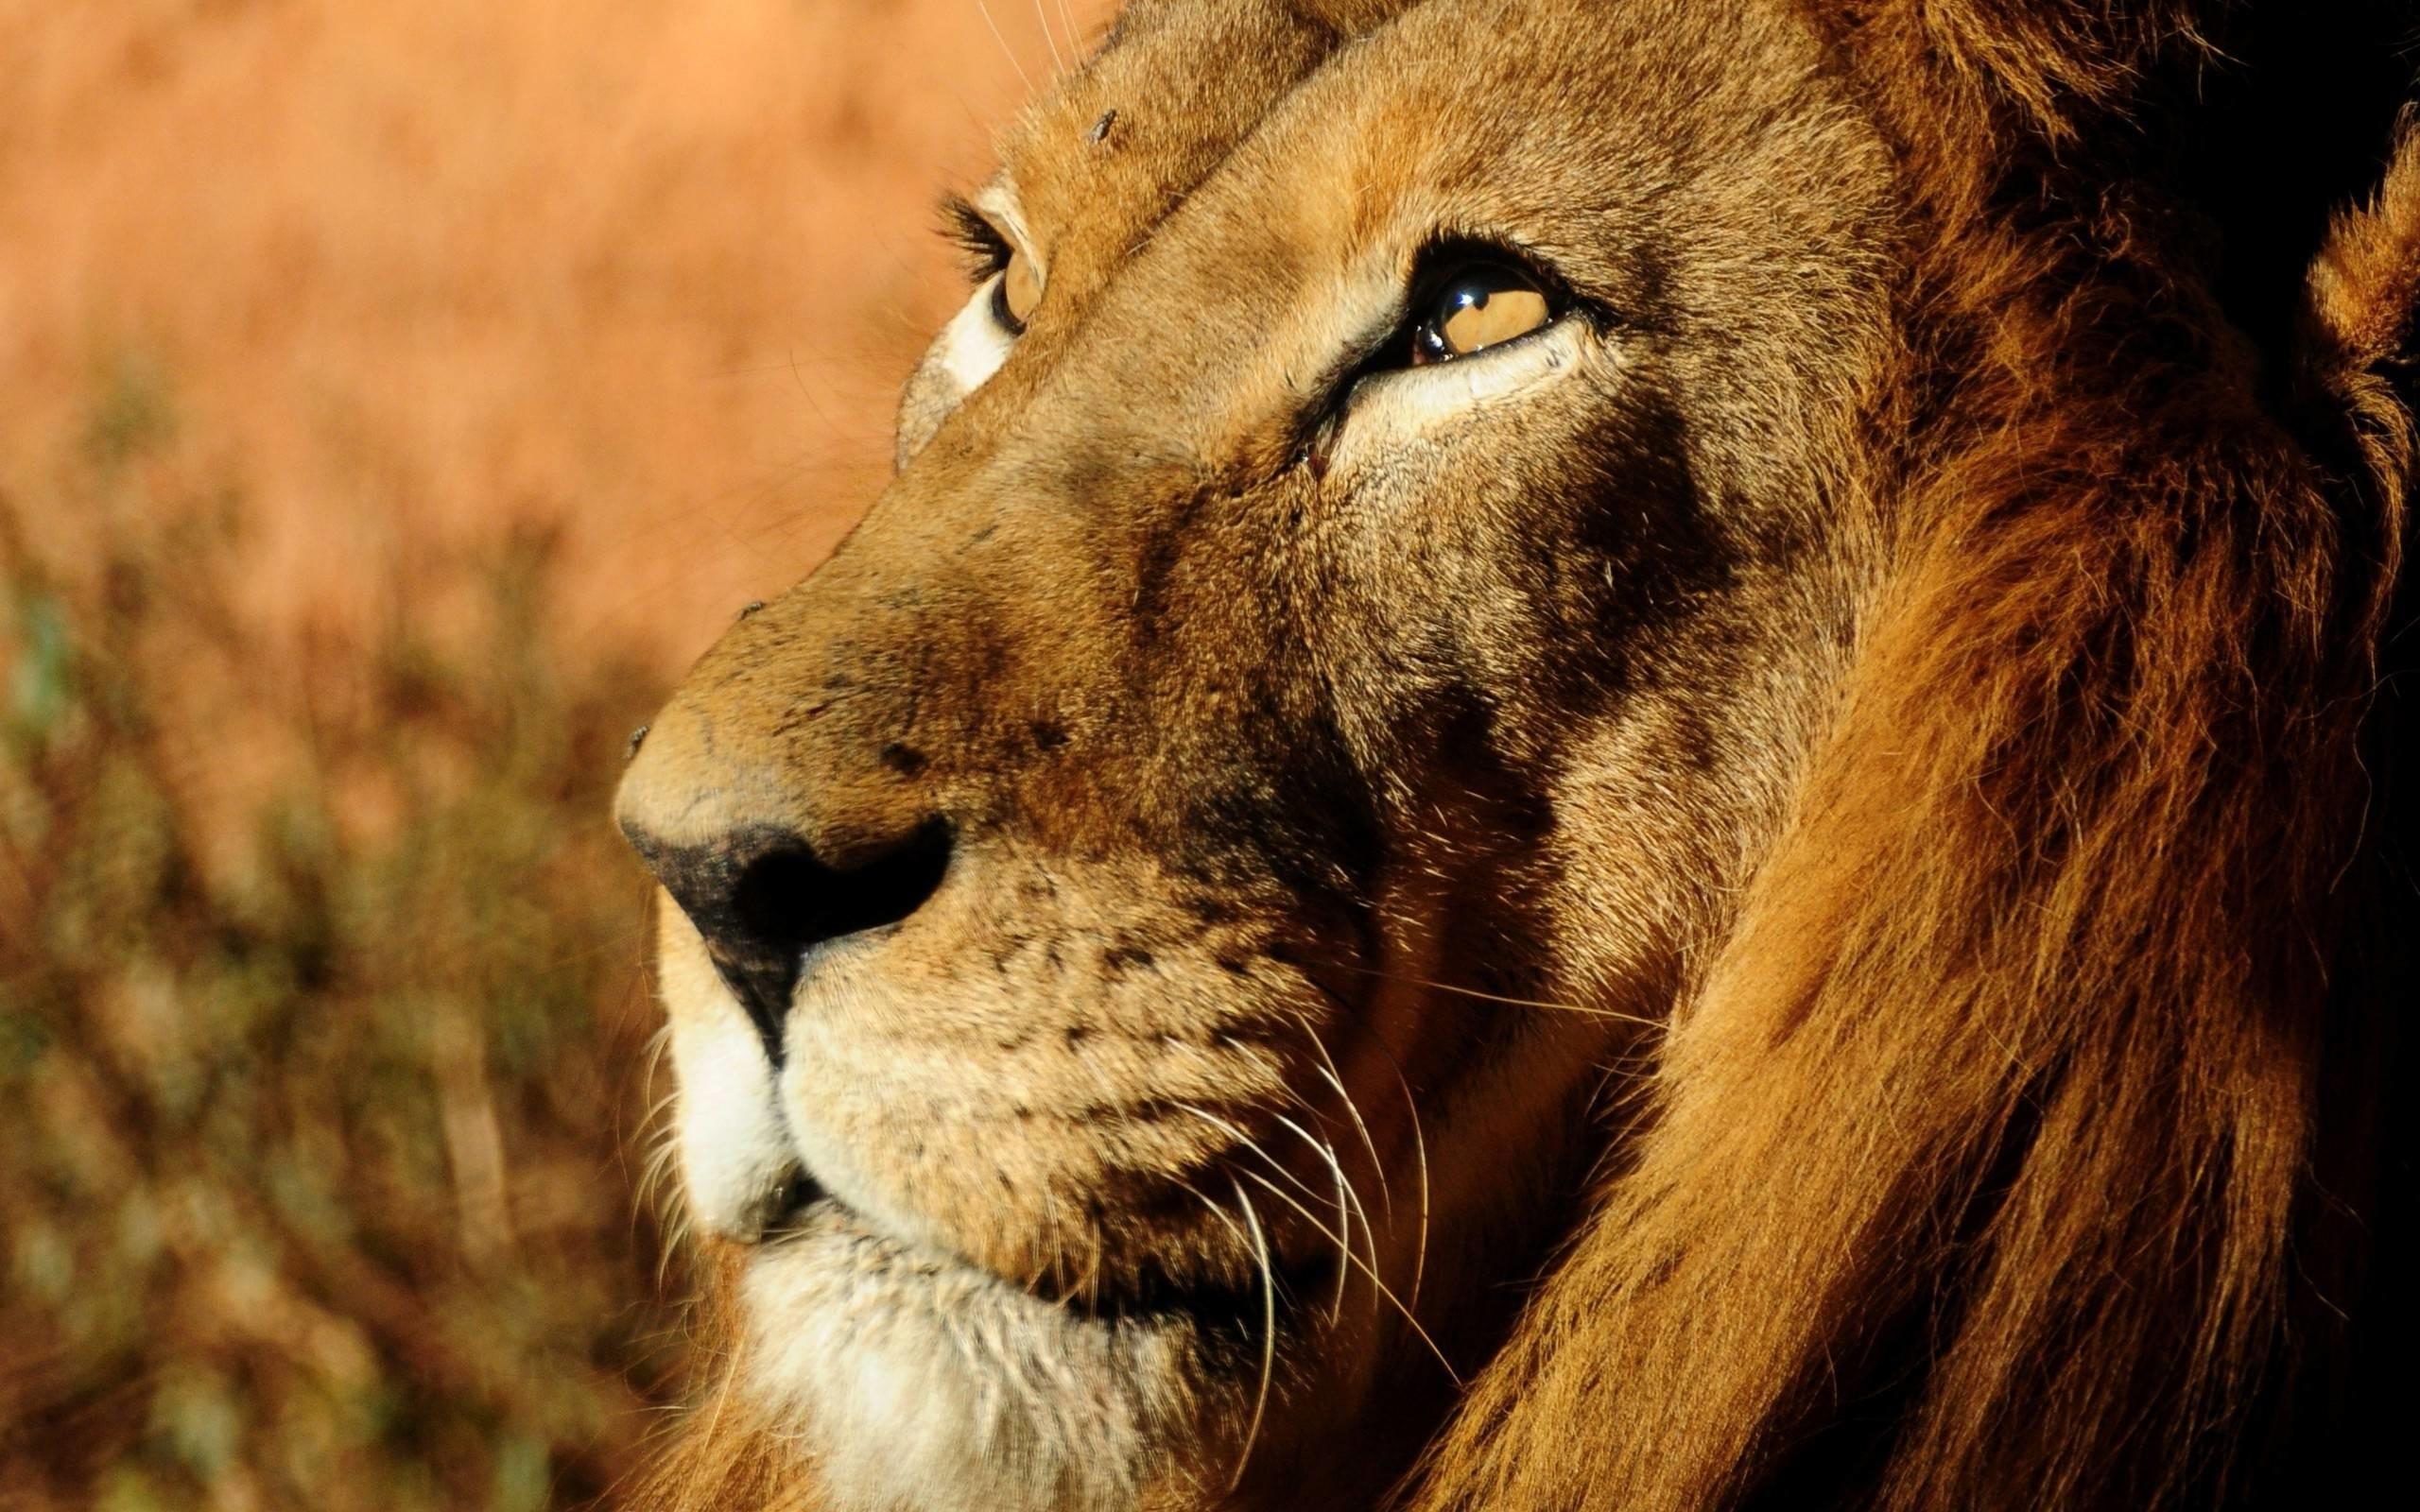 Res: 2560x1600, Lion Face High Definition Wallpaper